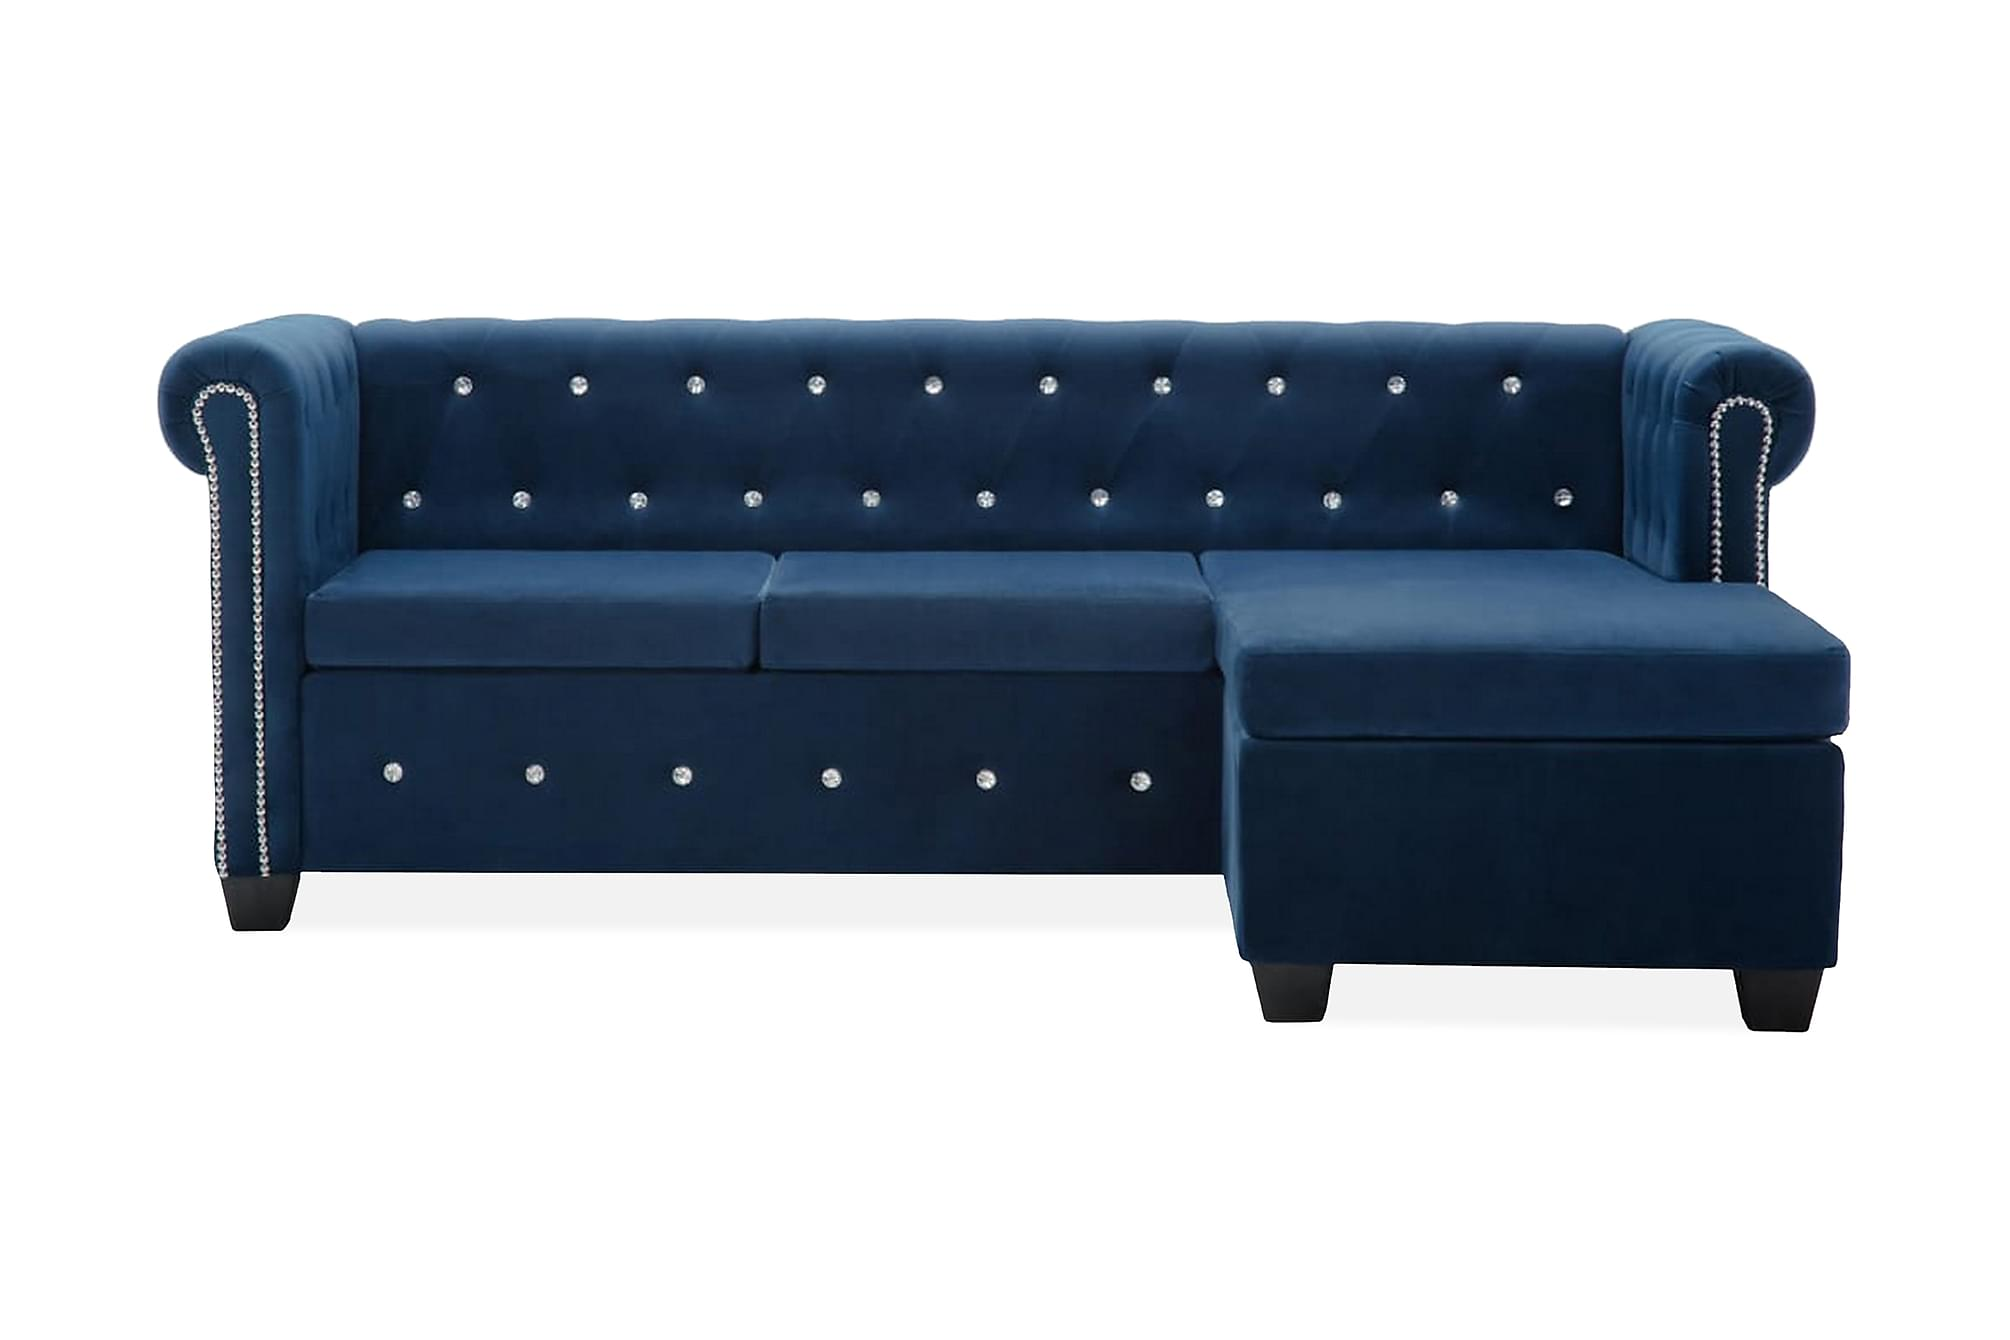 Chesterfieldsoffa L-formad sammet 199x142x72 cm blå